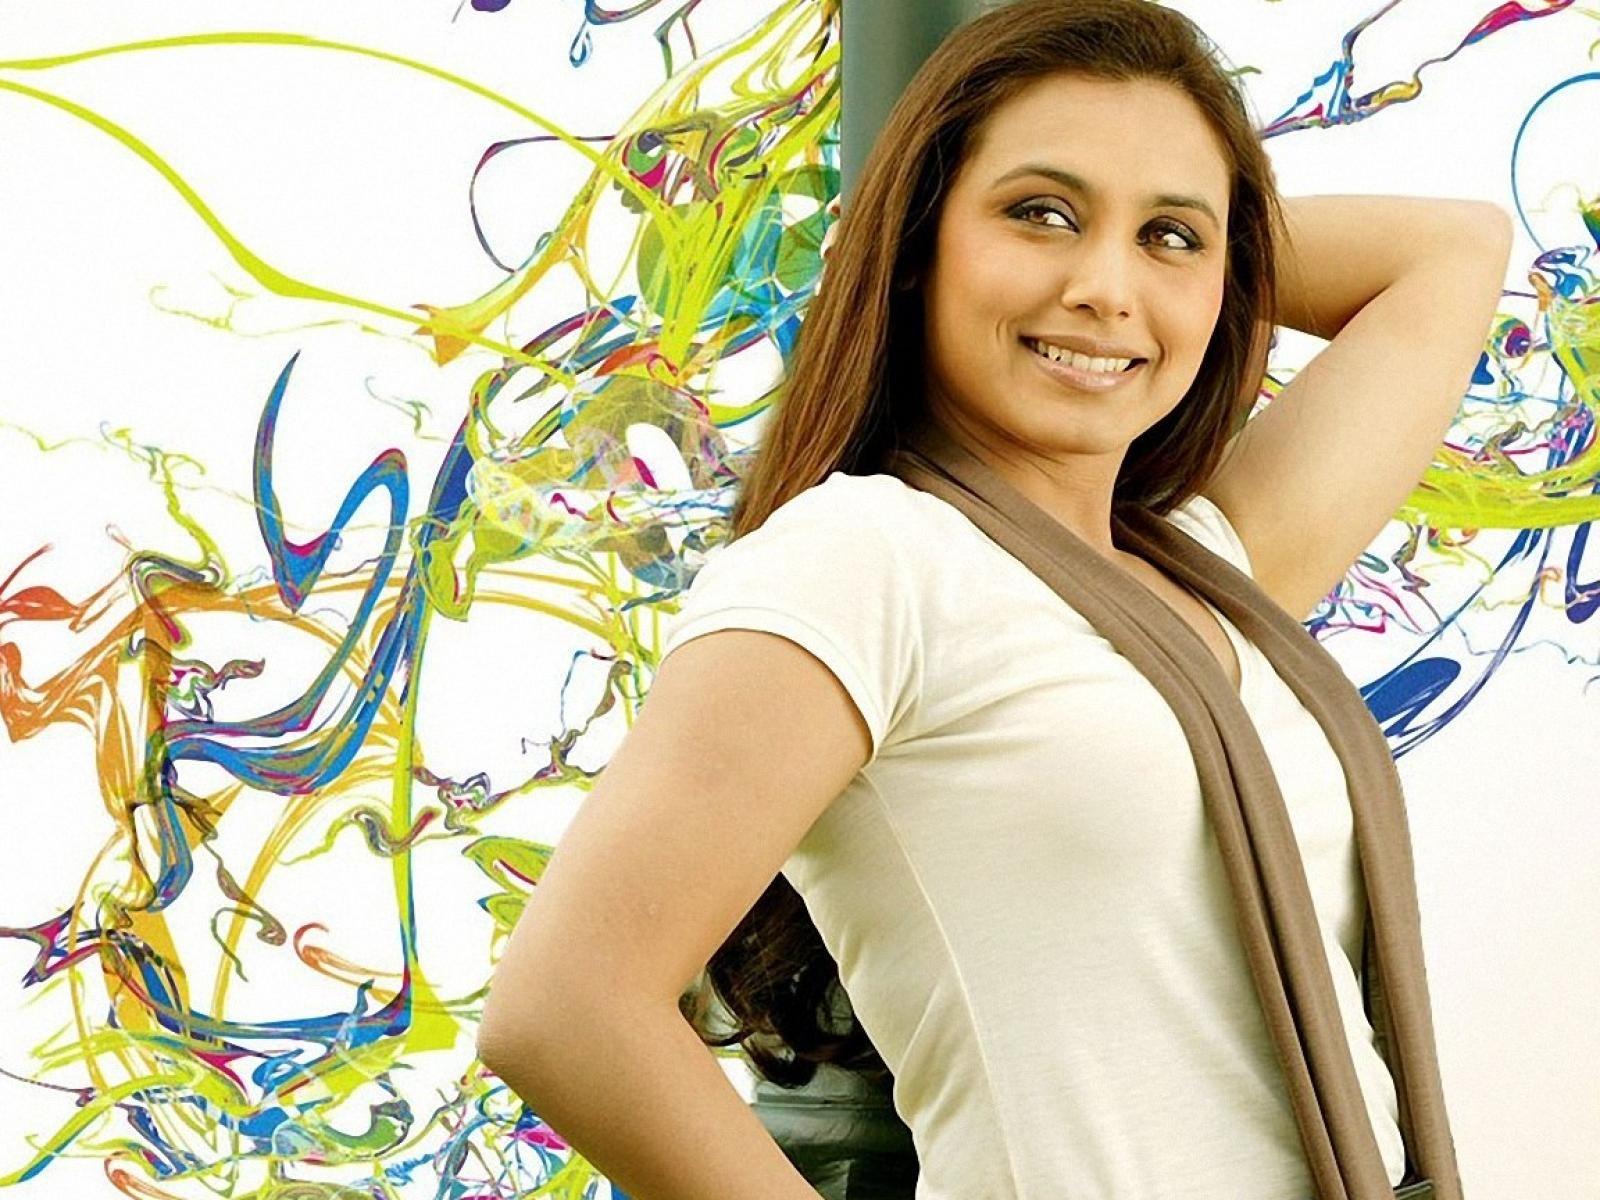 rani mukherjee | wallpapers hd free download | rani mukherjee in